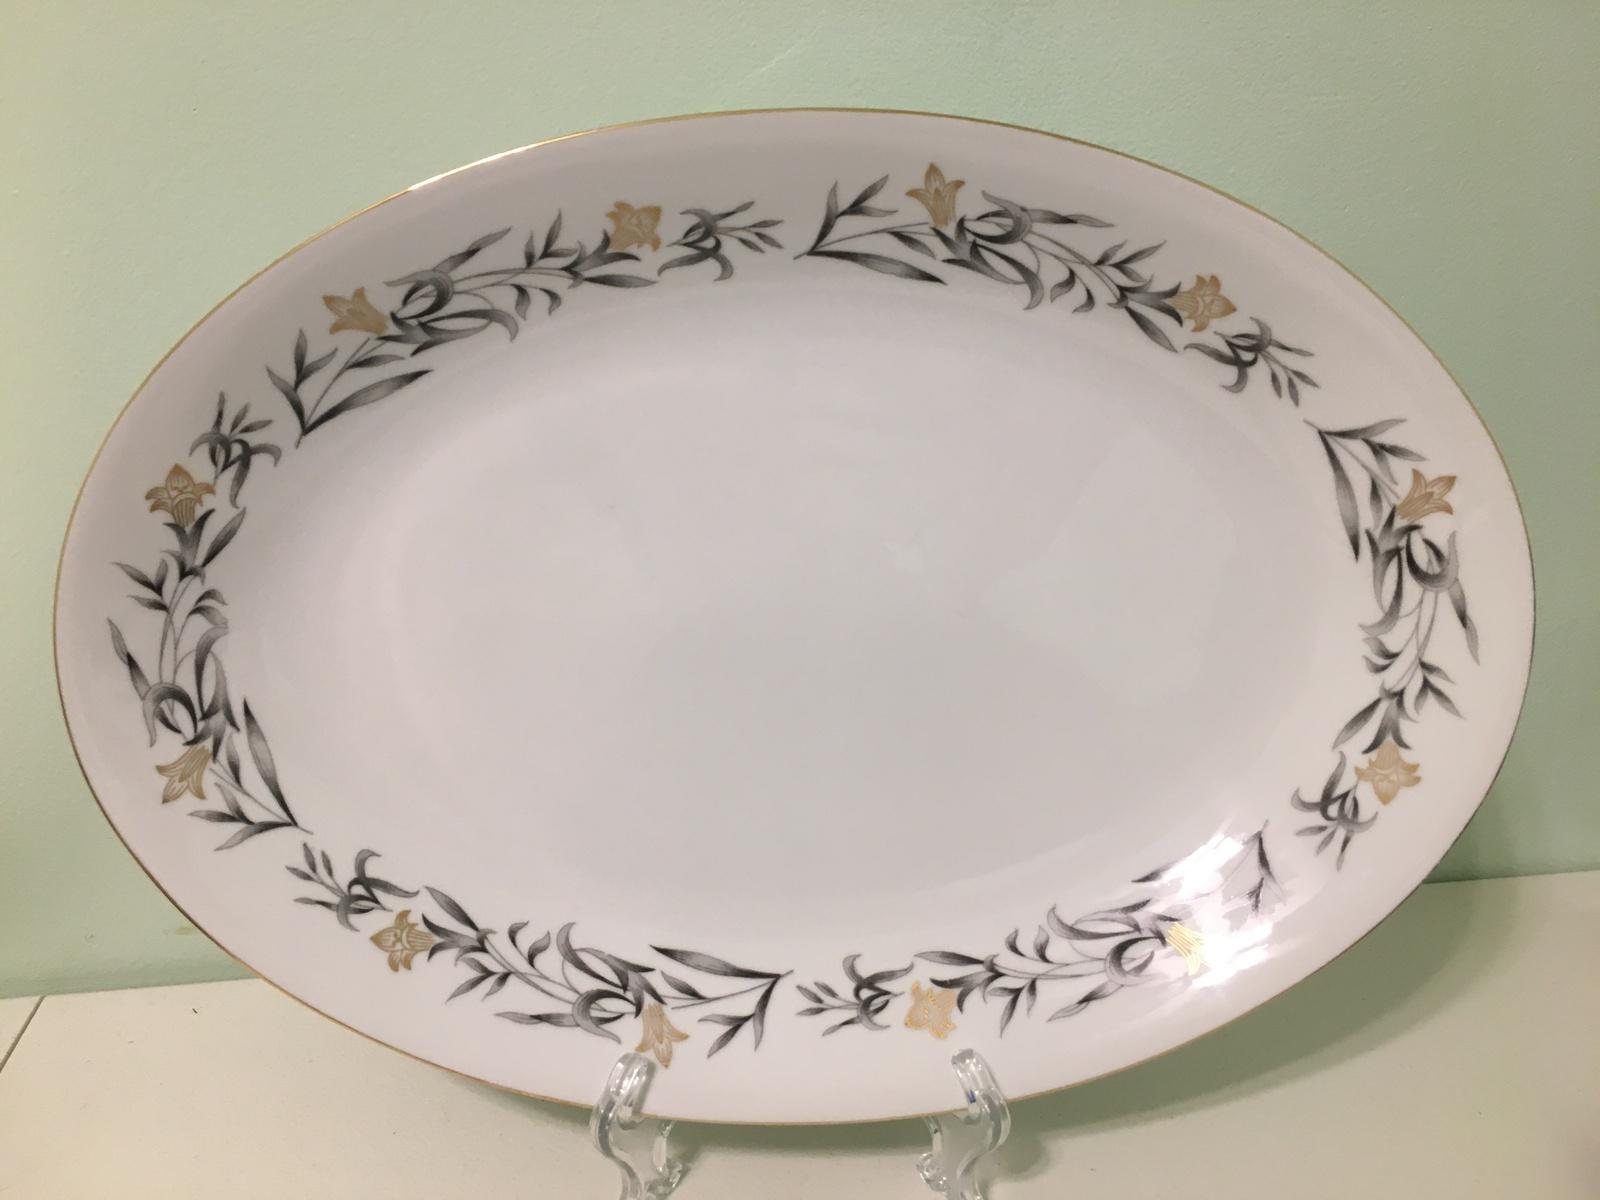 Arlen Fine China Regency Oval Serving Platter~Gold Flowers, Gray Leaves, & Gold  - $34.65